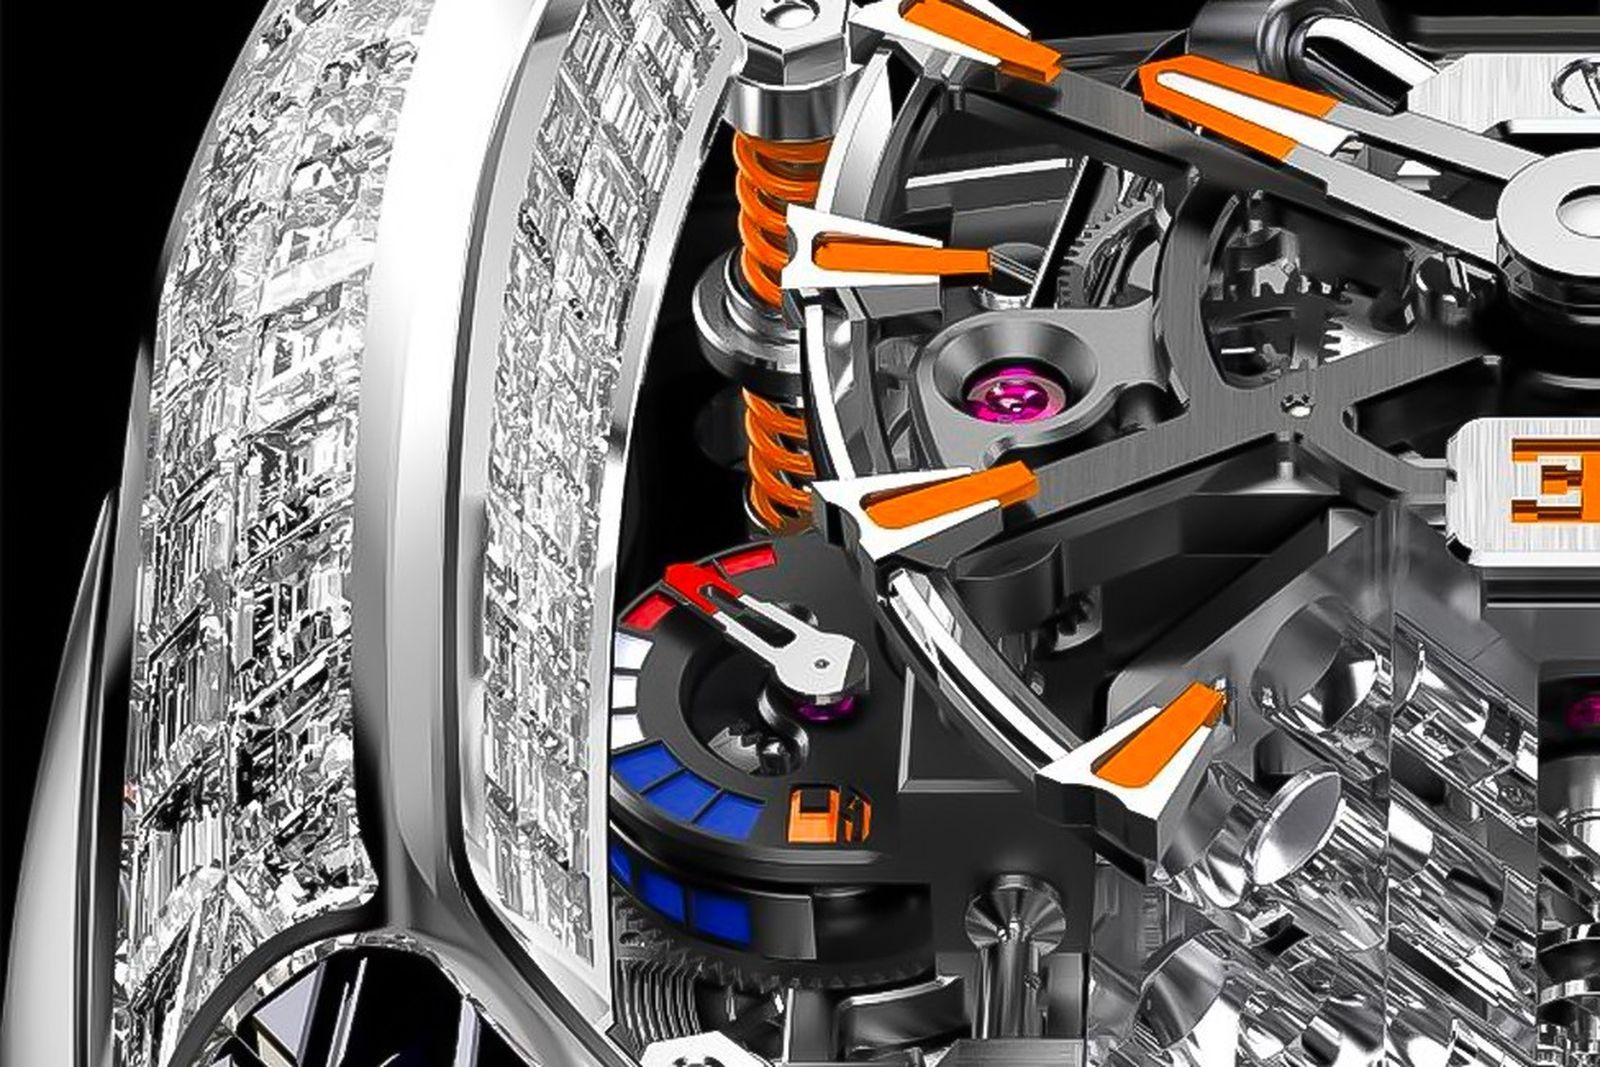 jacob-and-co-bugatti-chiron-tourbillon-black-orange-03